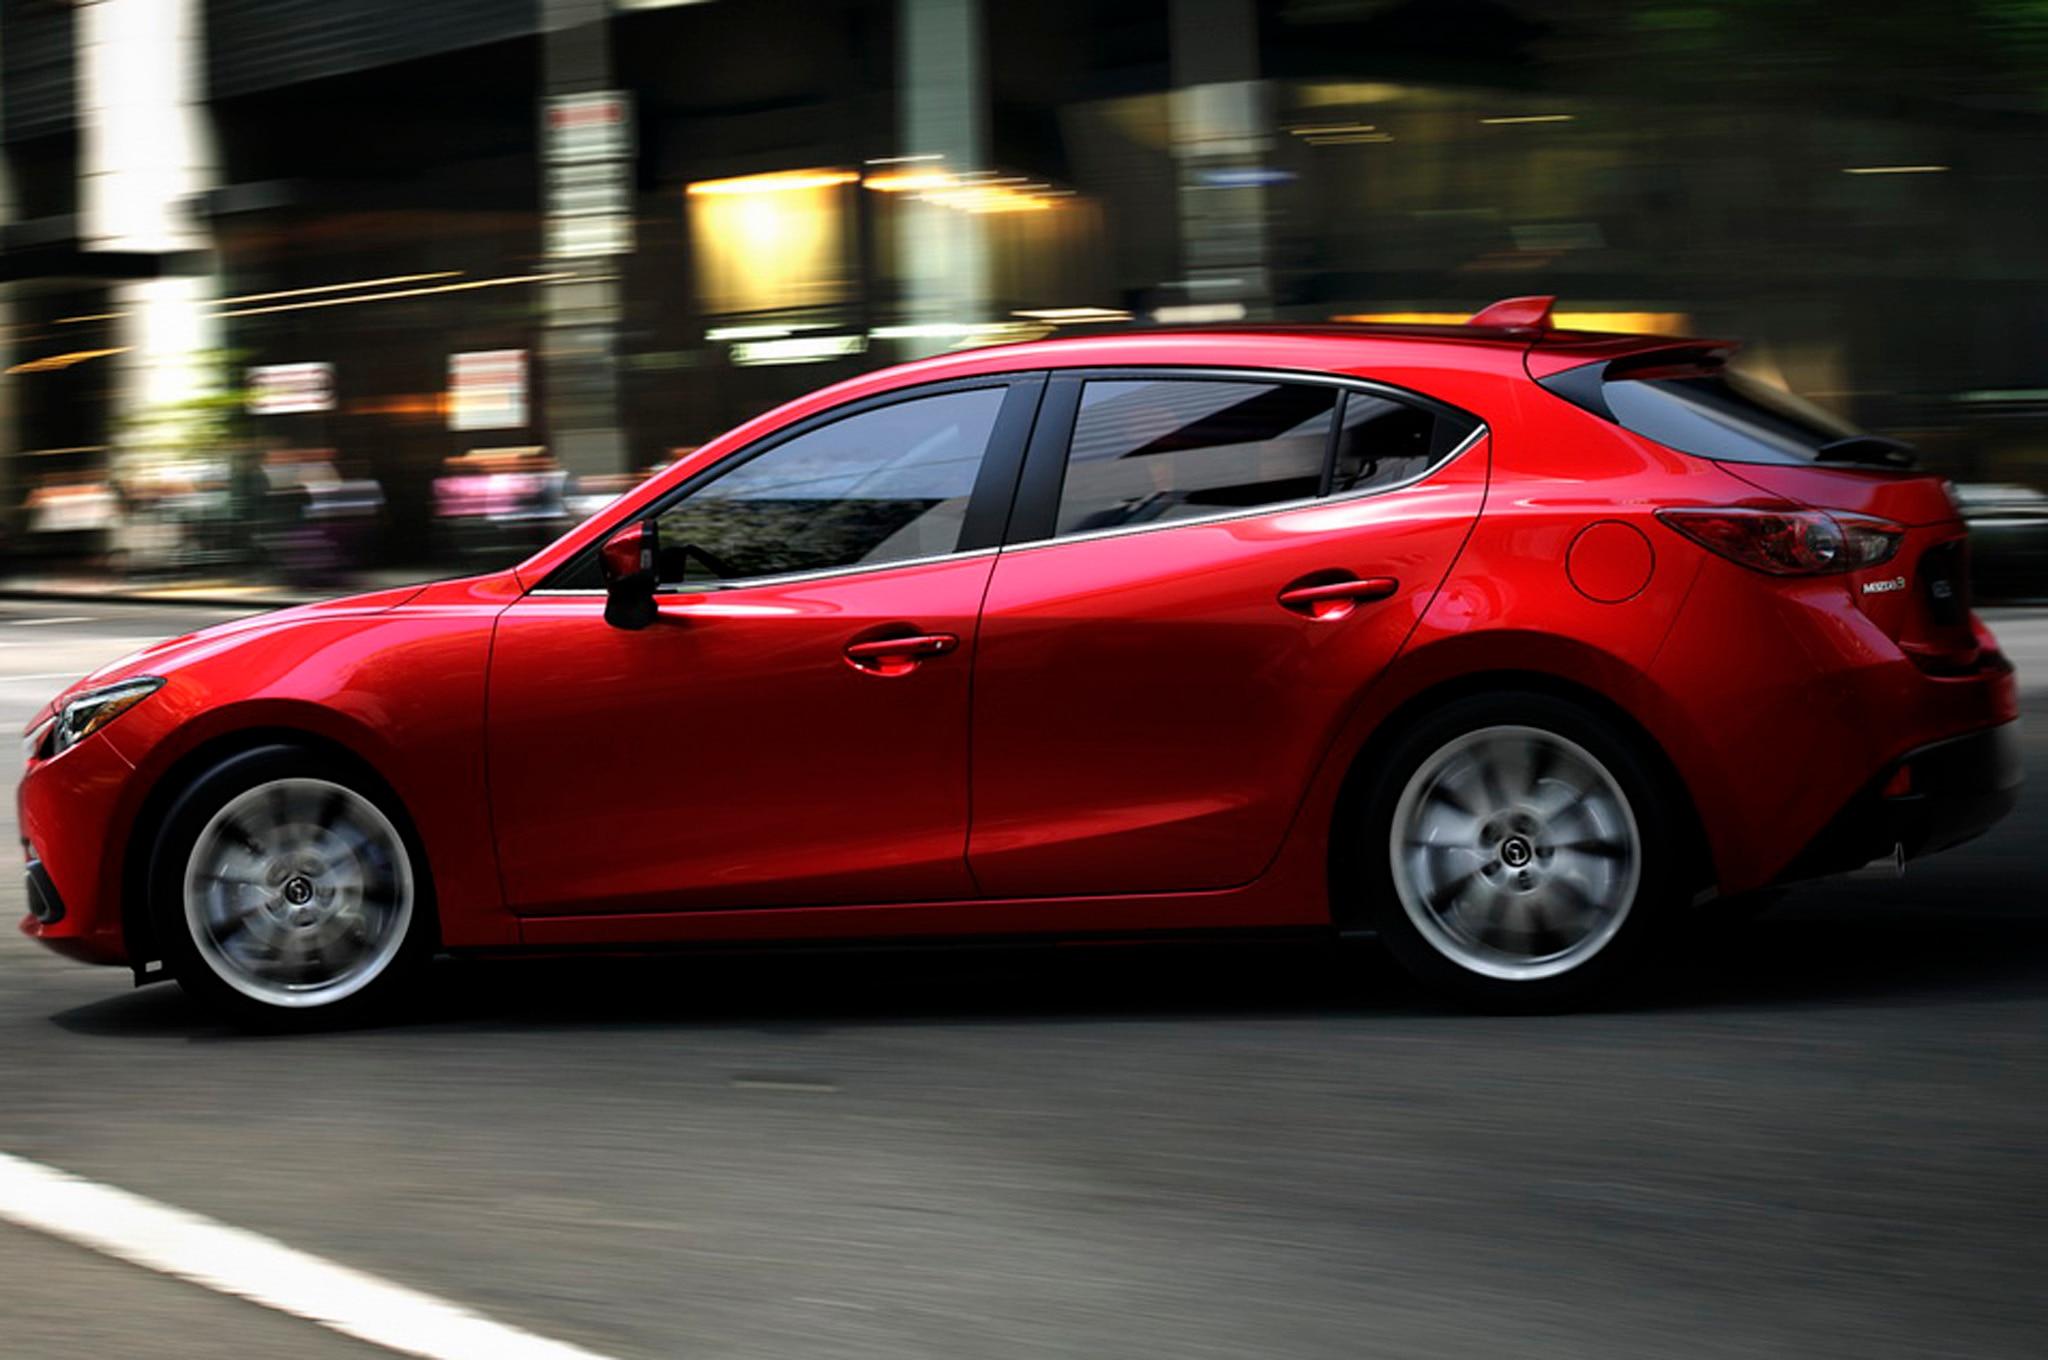 2014 Mazda 3 Profile1